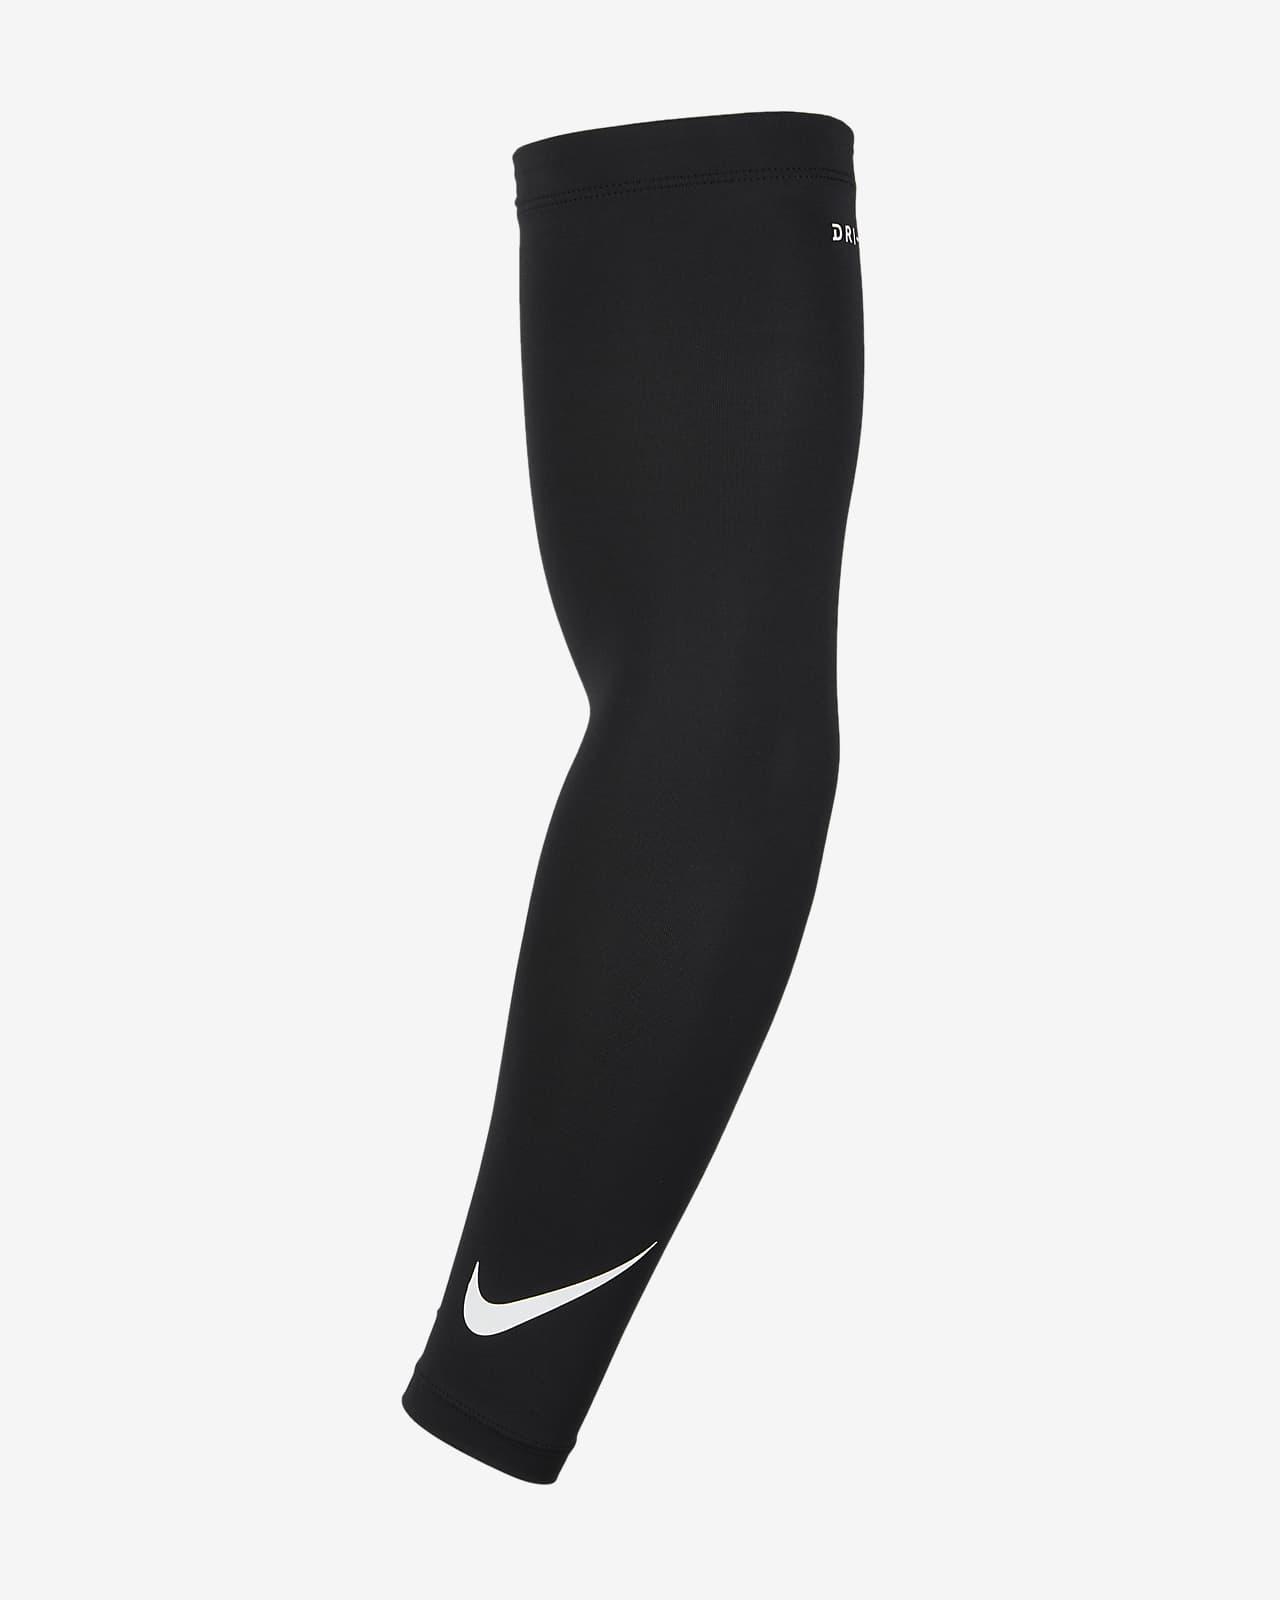 Nike Solar Golf Sleeves